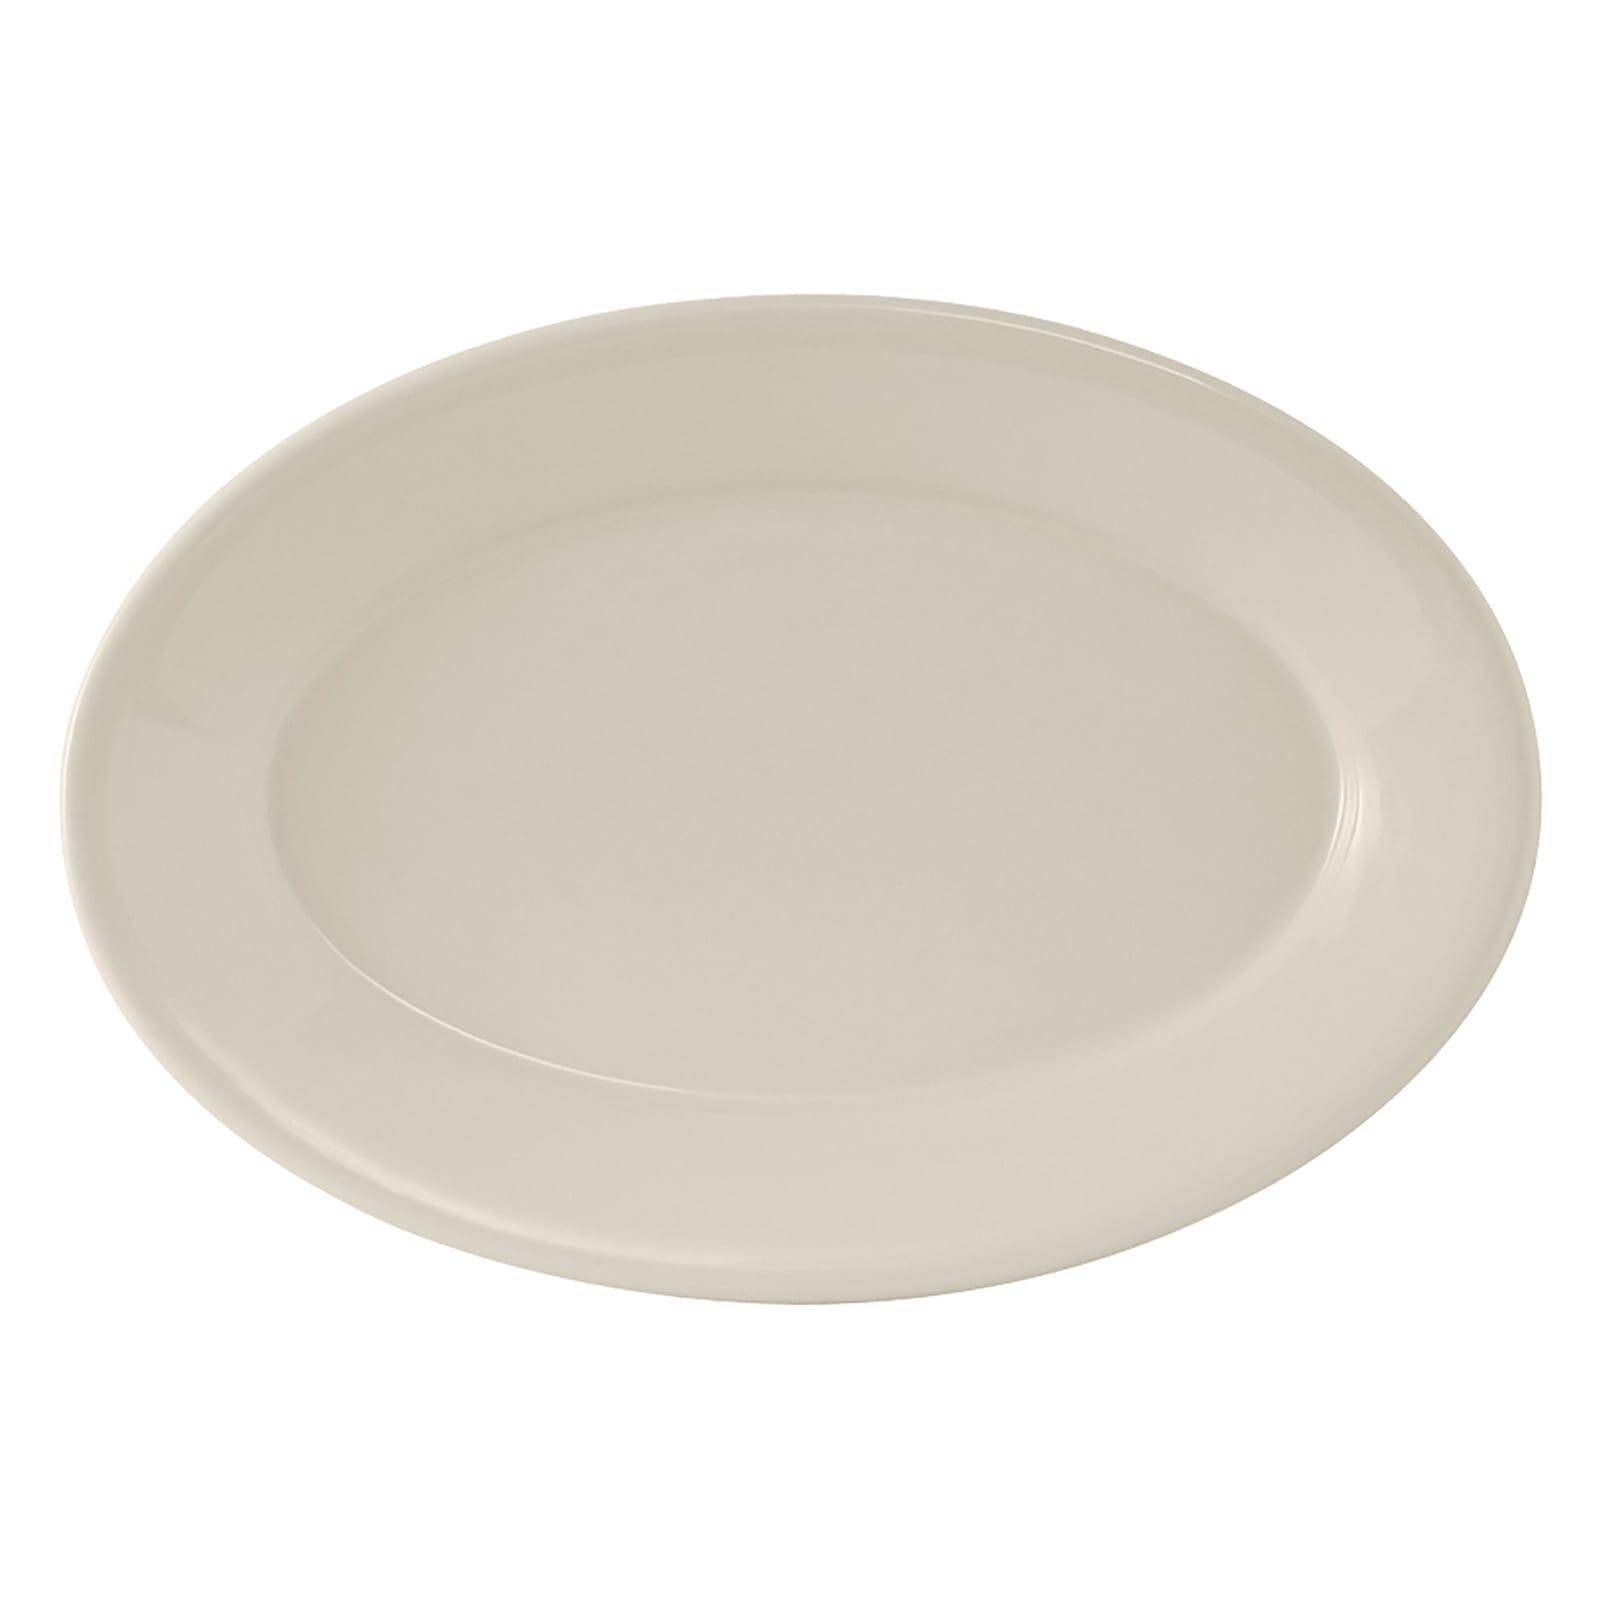 "Tuxton TRE-912 Oval Reno Platter - 10.63"" x 7.38"", Ceramic, American White"